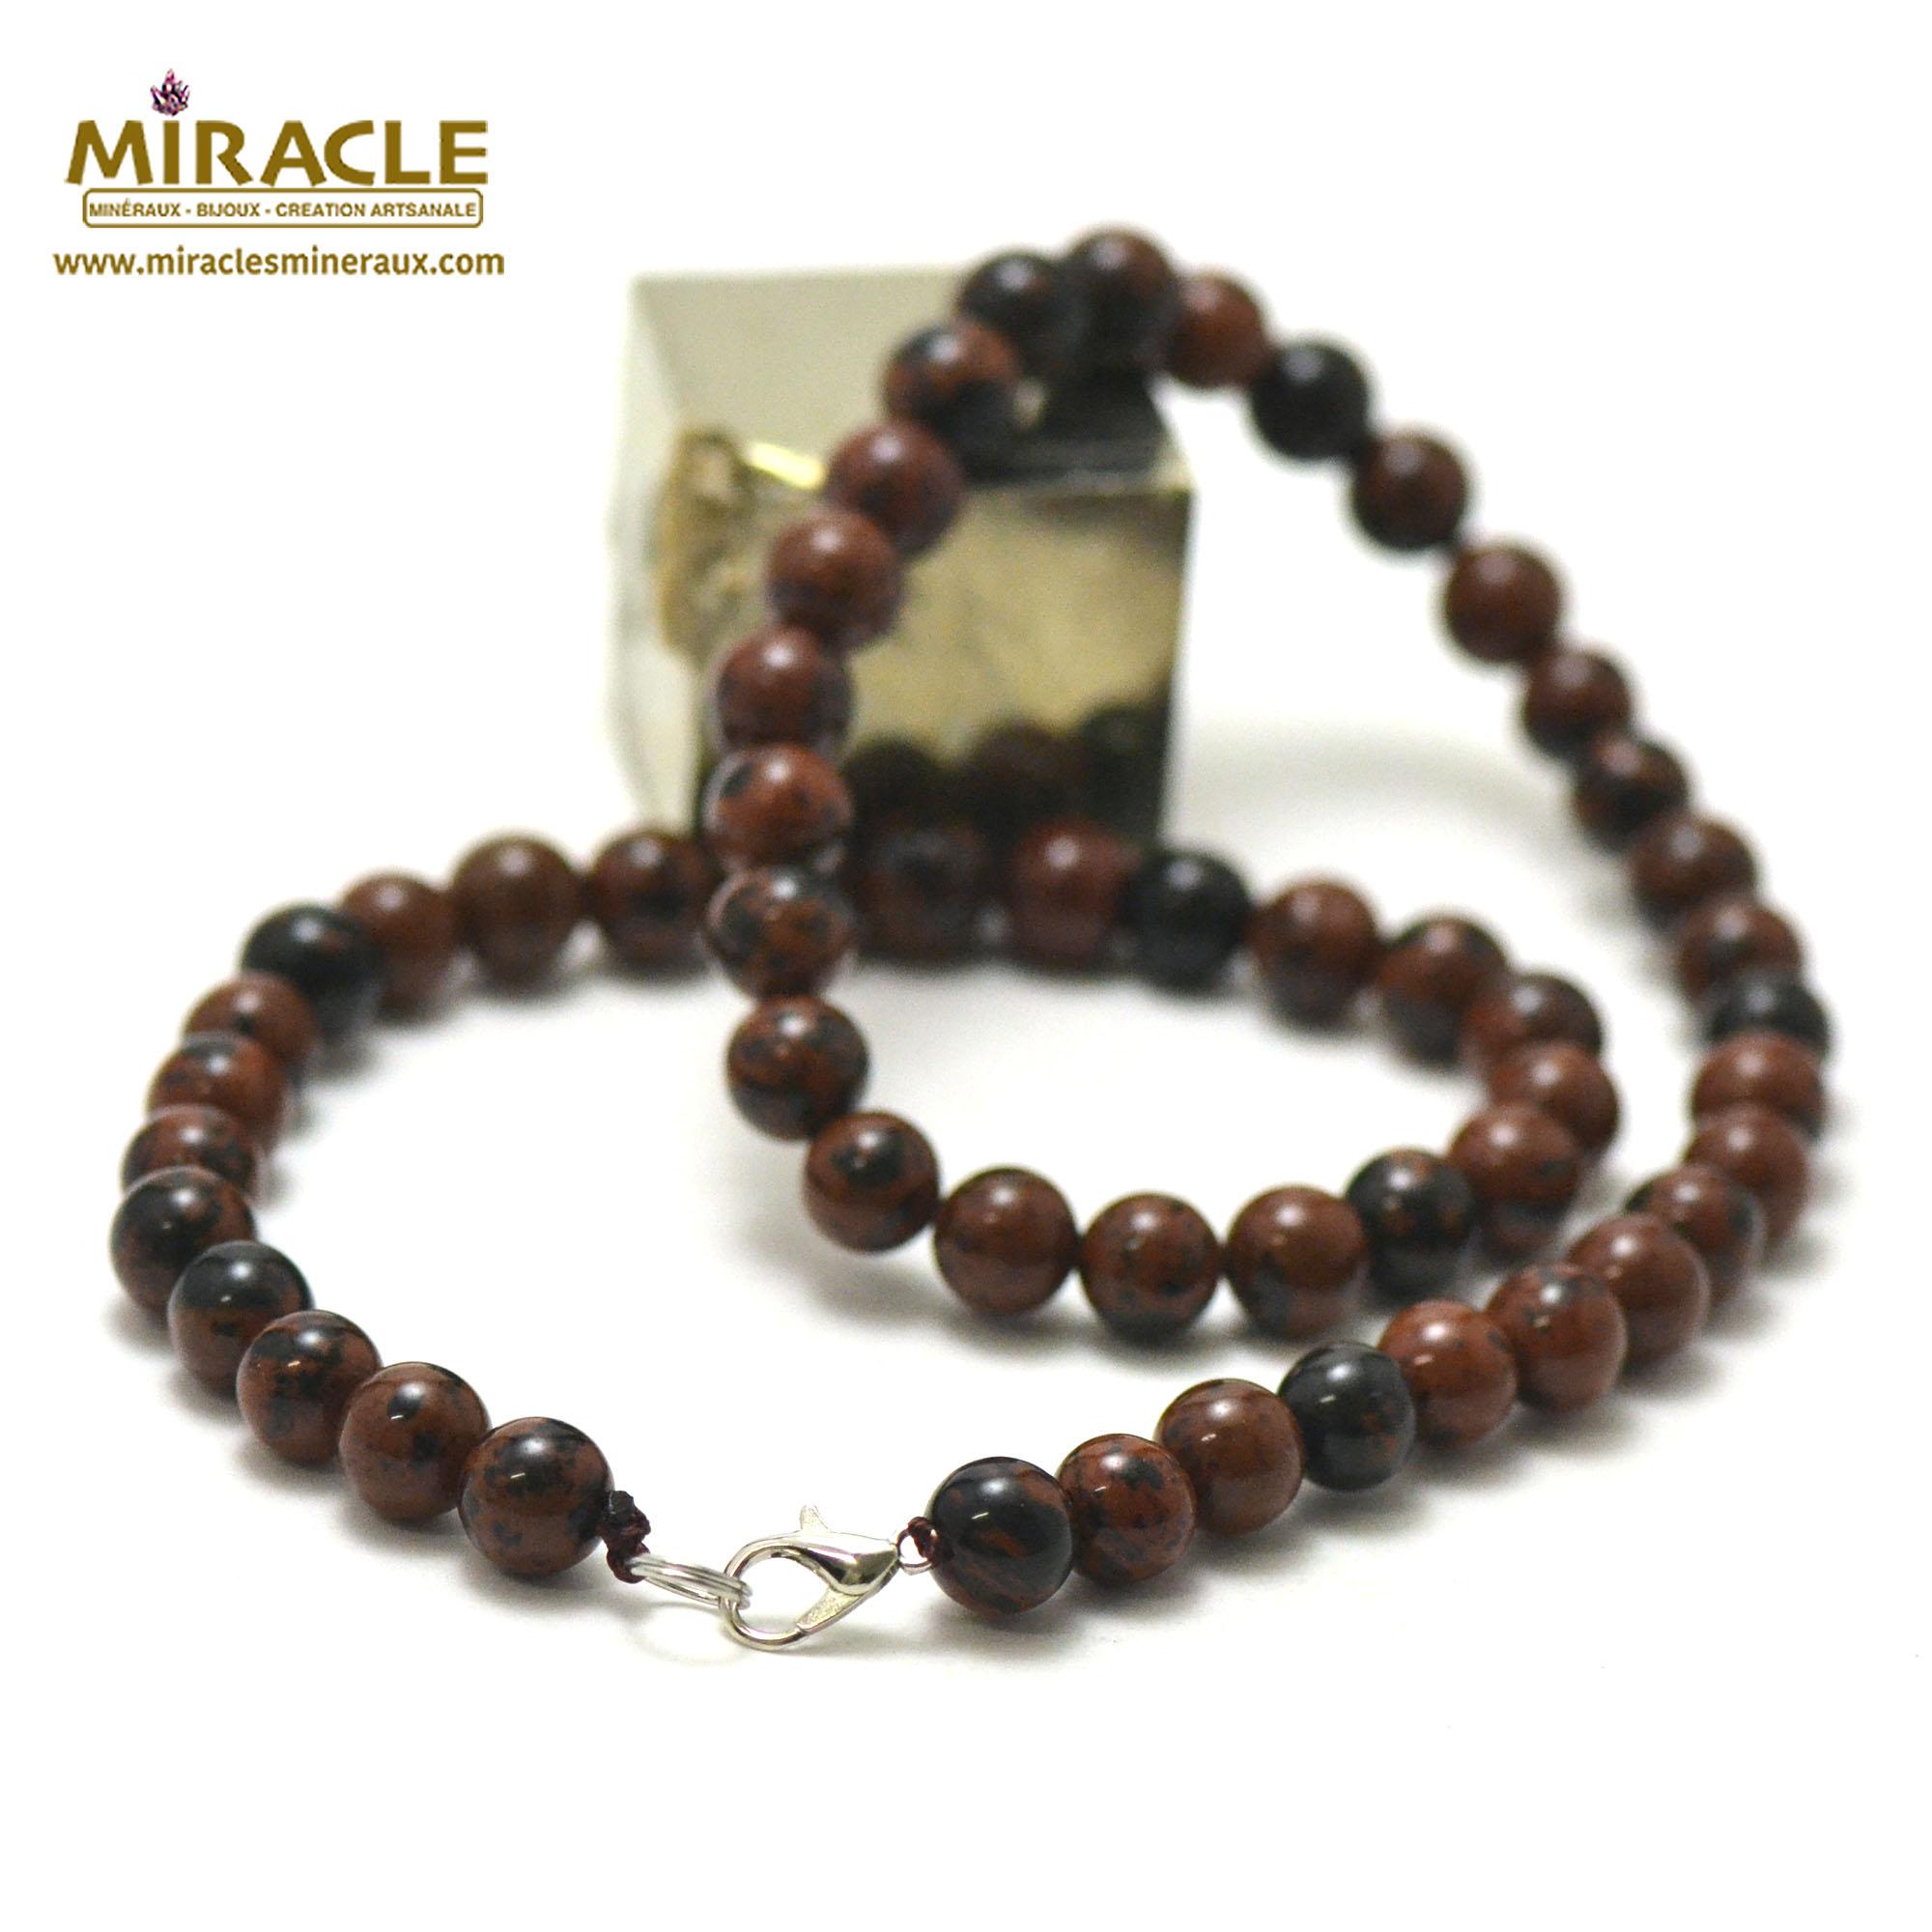 collier obsidienne acajou perle ronde 8 mm